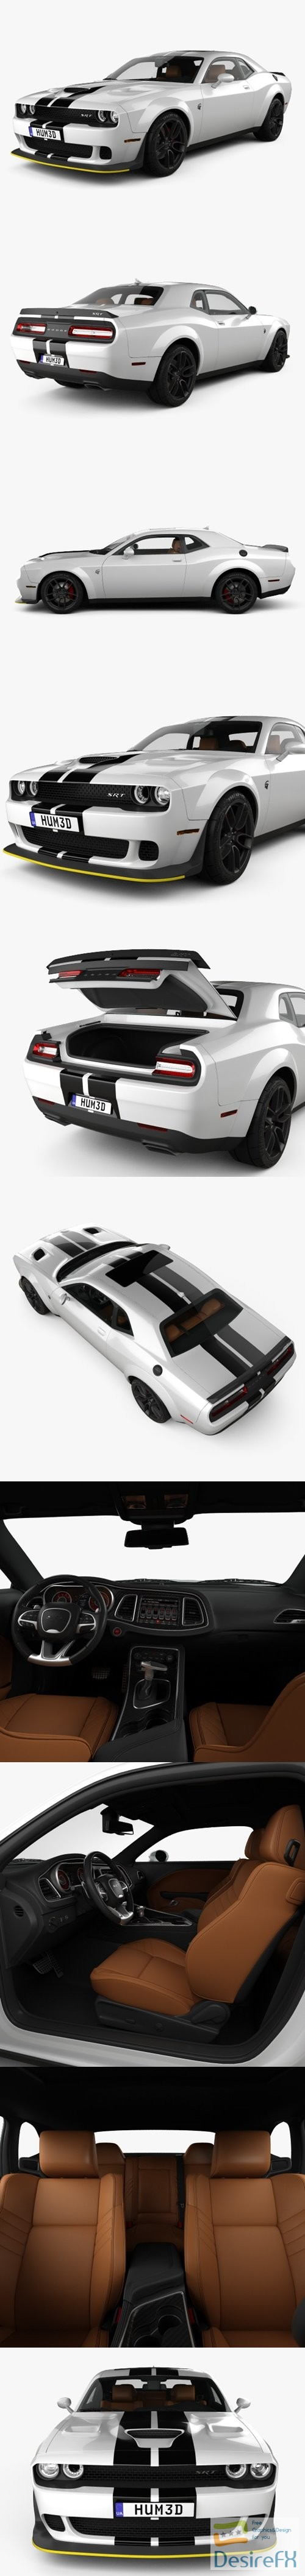 3d-models - Dodge Challenger SRT Hellcat WideBody with HQ interior 2018 3D Model